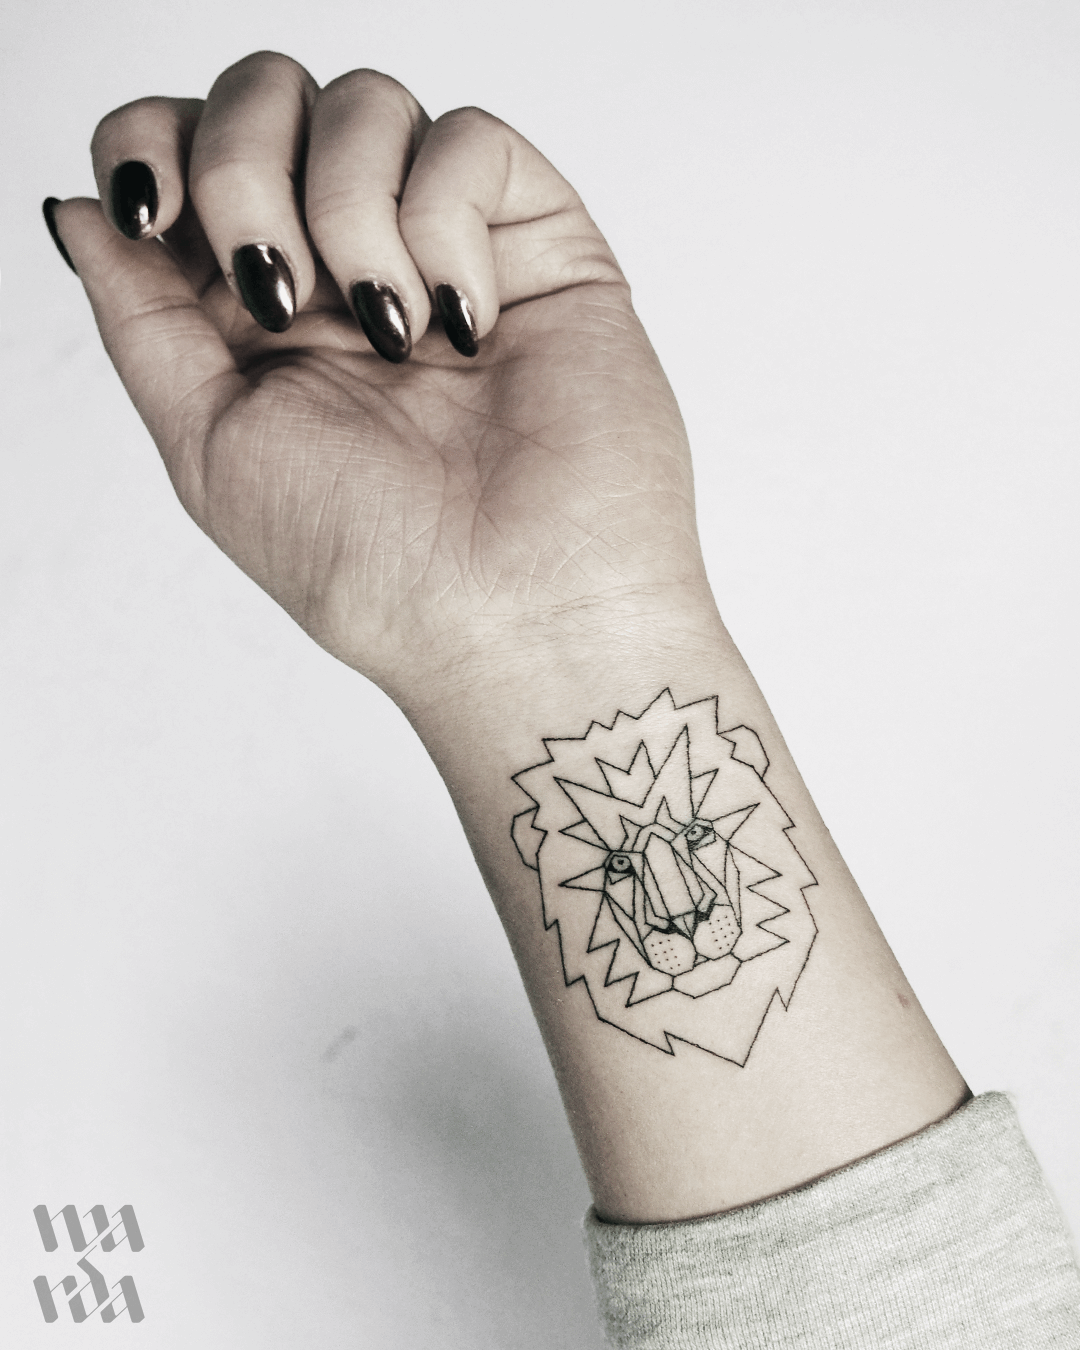 Lion tattoo on the wrist by Warda